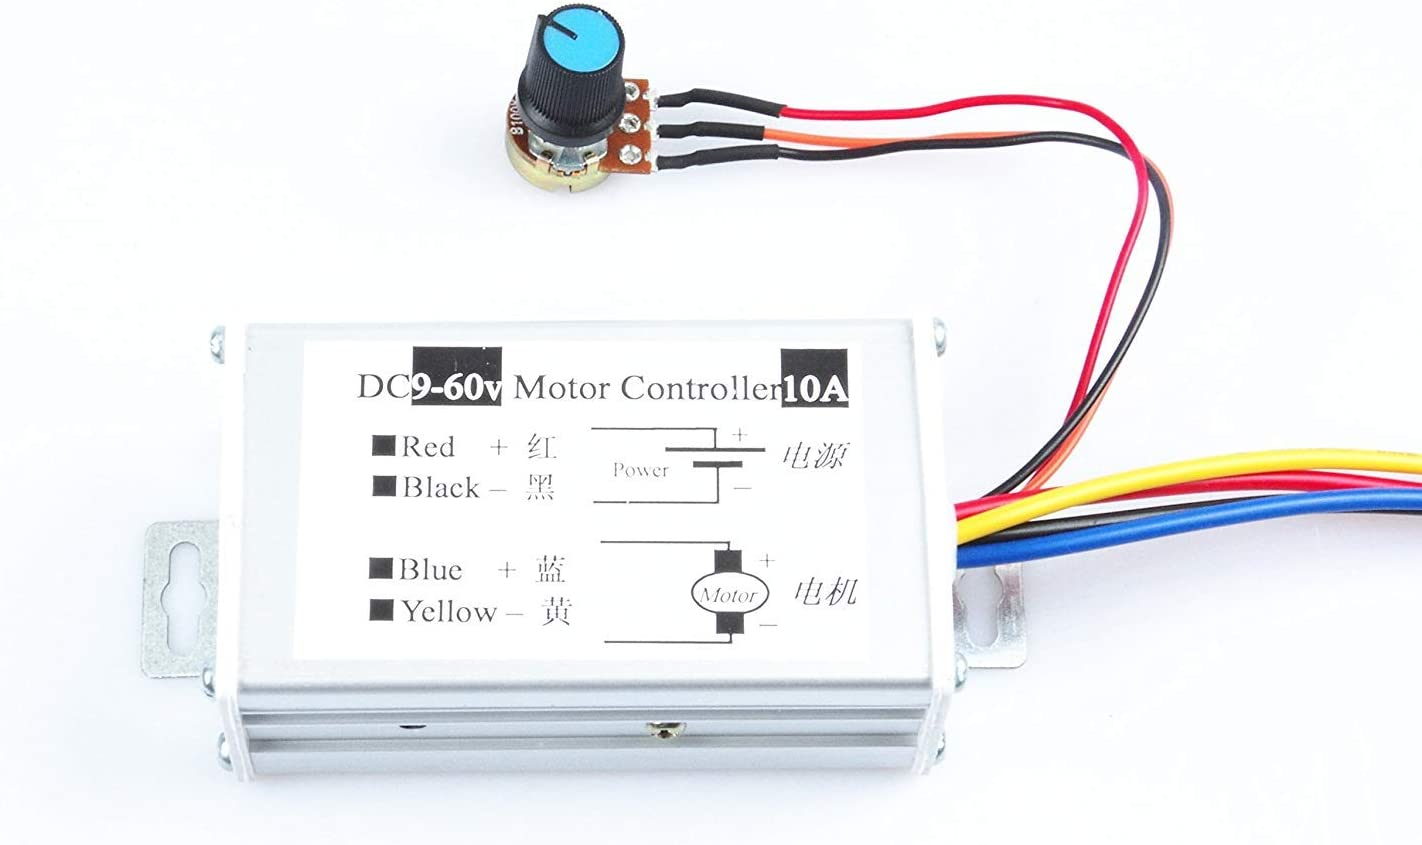 FGBORP WM Motor Speed Controller 10A DC 9V-60V 12V 24V 36V 48V Brush Motor Controller